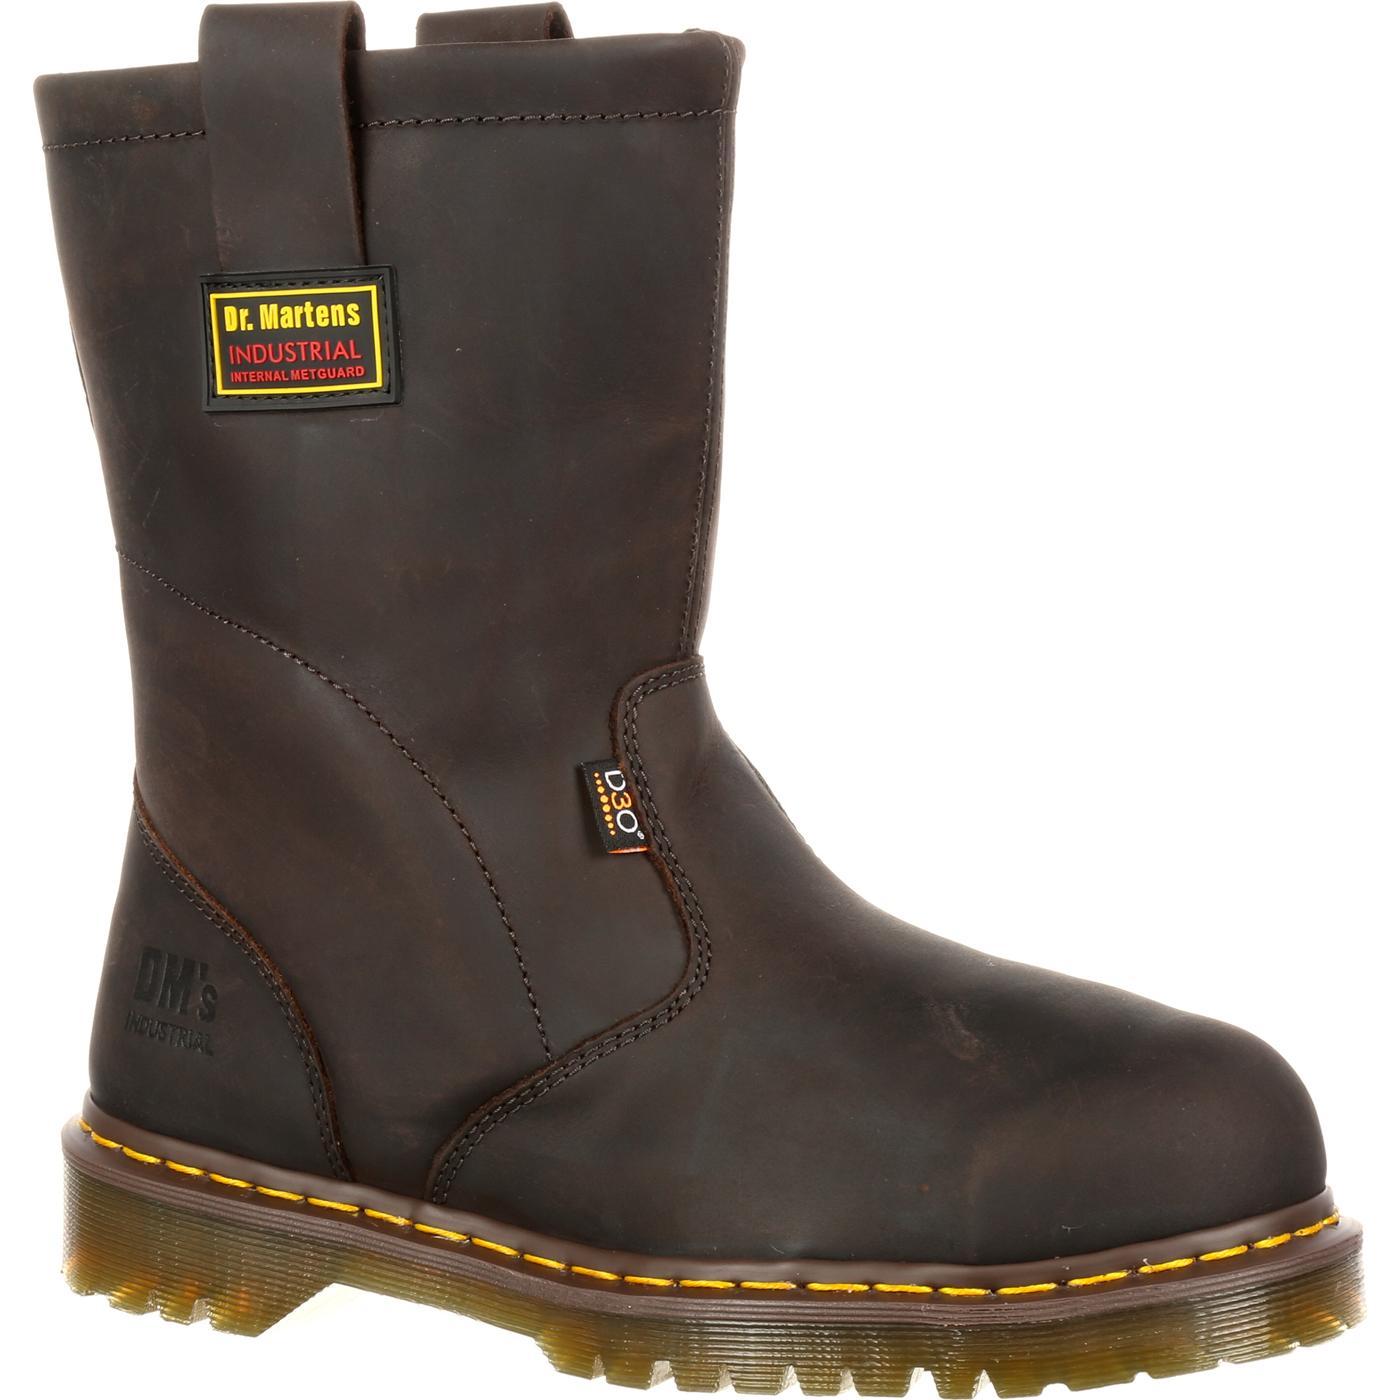 dr martens  boots mens size 12 internal metatarsals